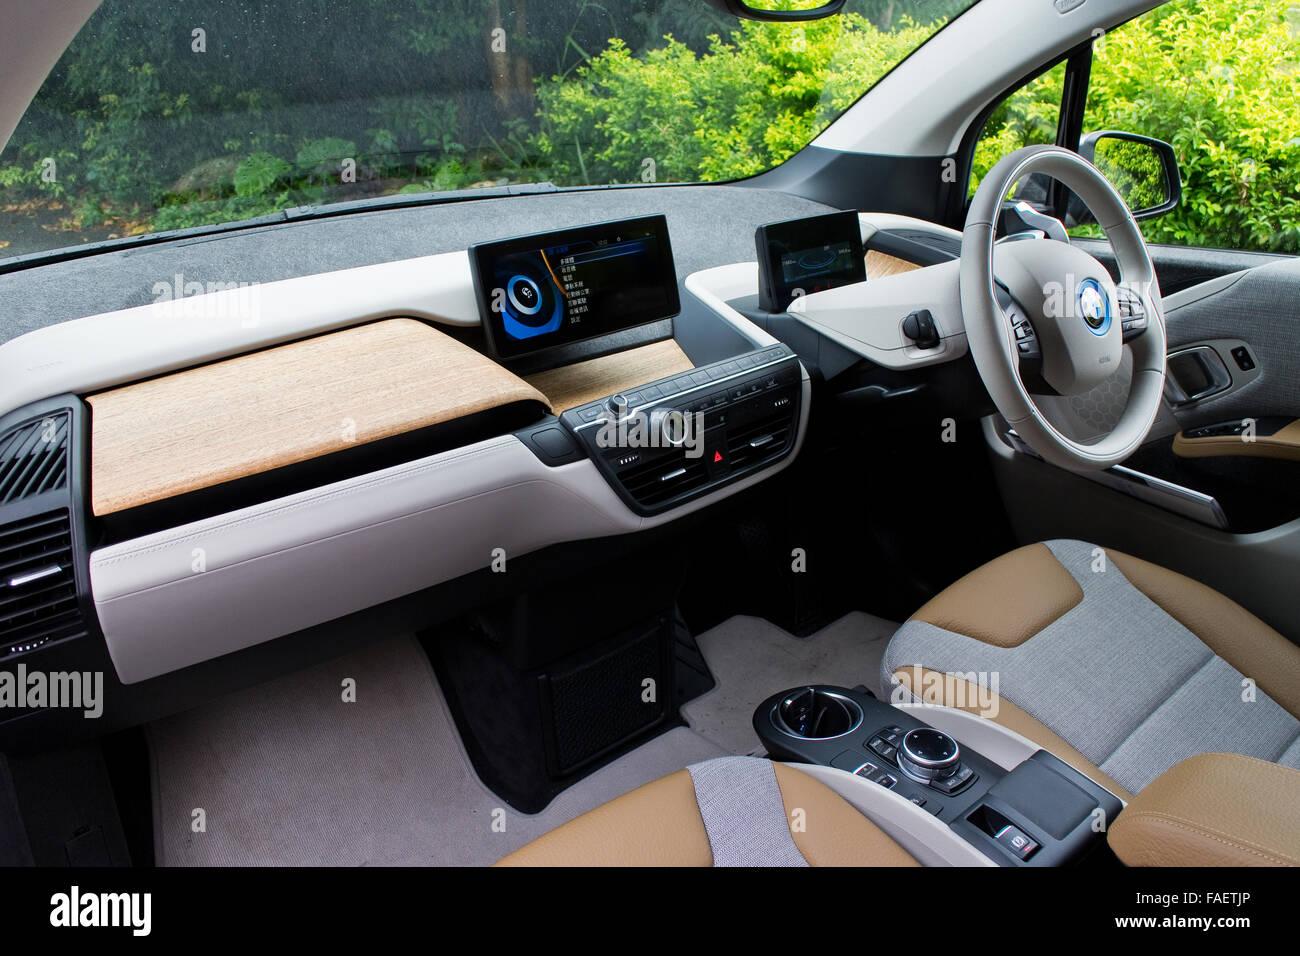 Bmw I3 Electric Car Interior Stock Photos Bmw I3 Electric Car